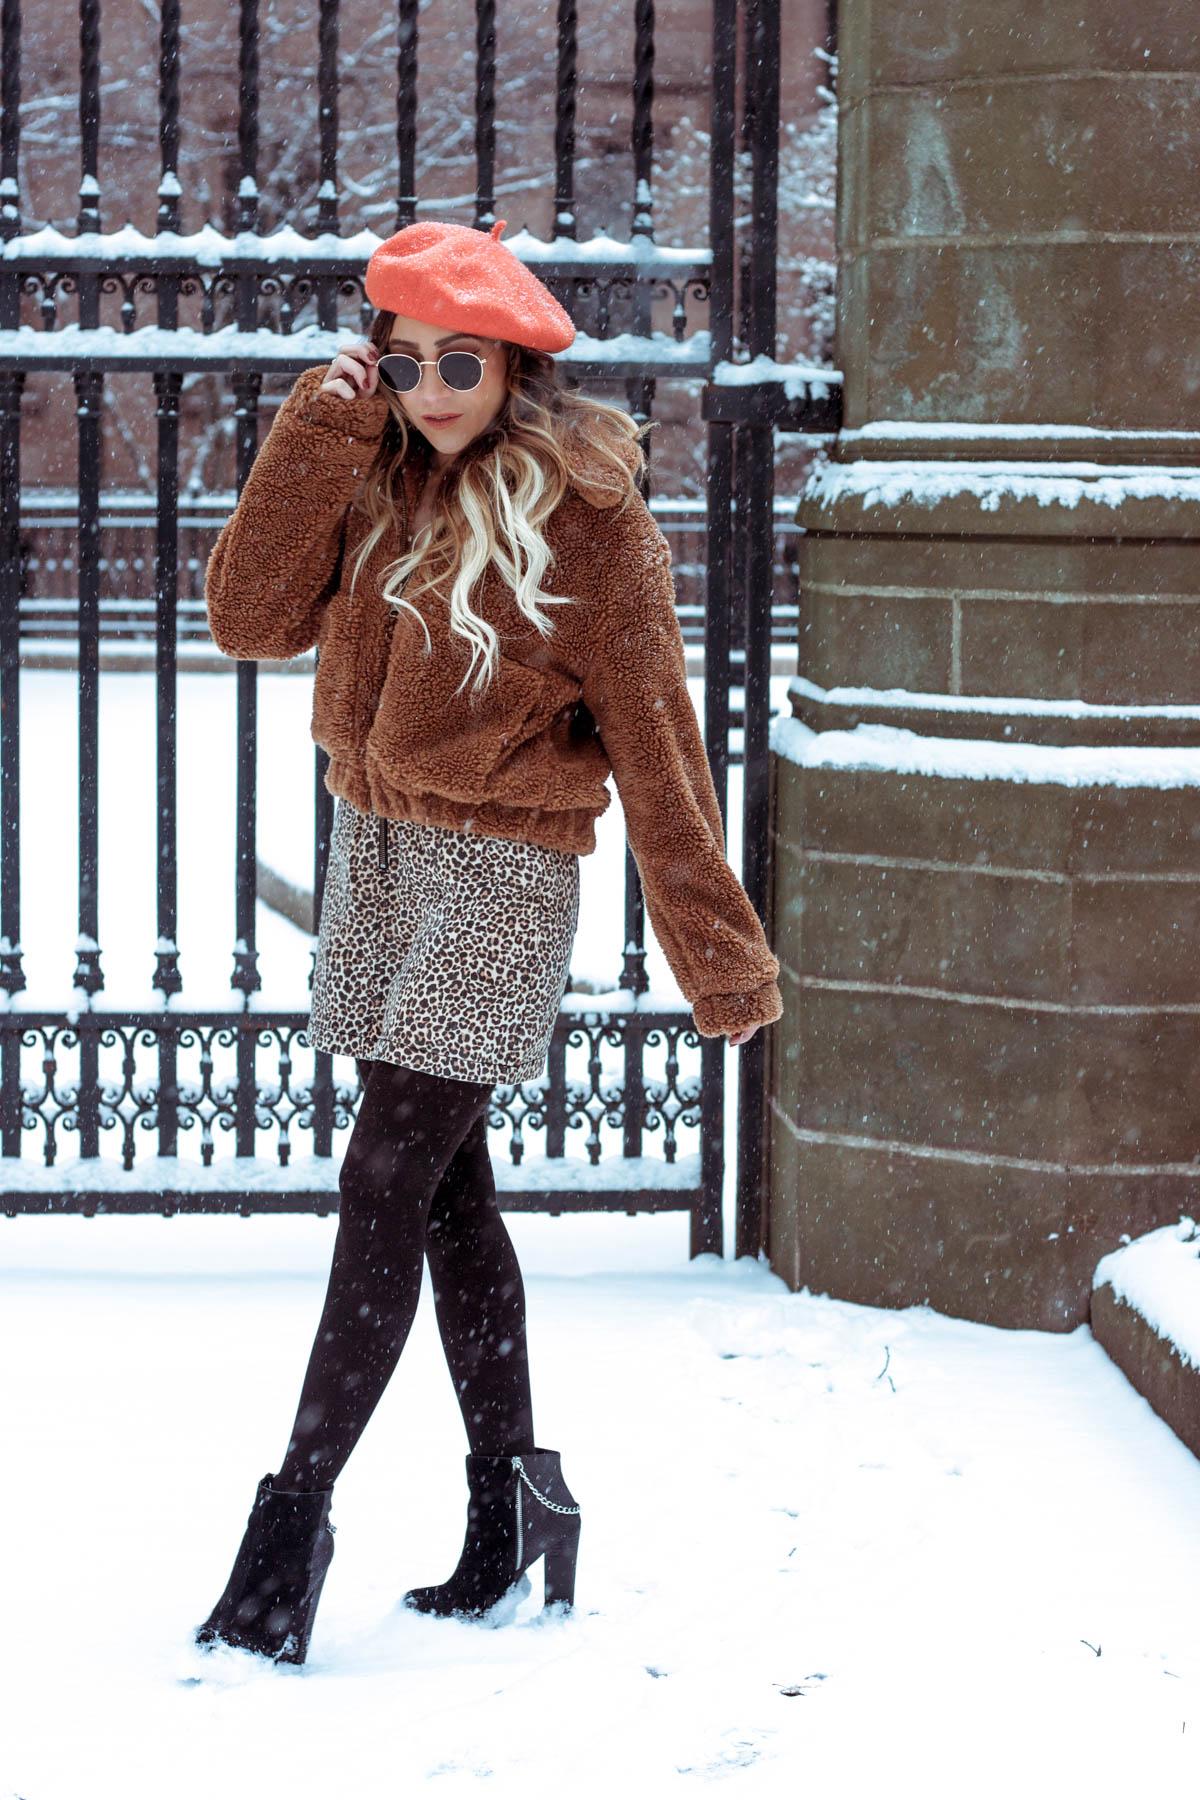 Urban Outfitters Teddy Coat, Leopard Print Skirt, Orange Beret